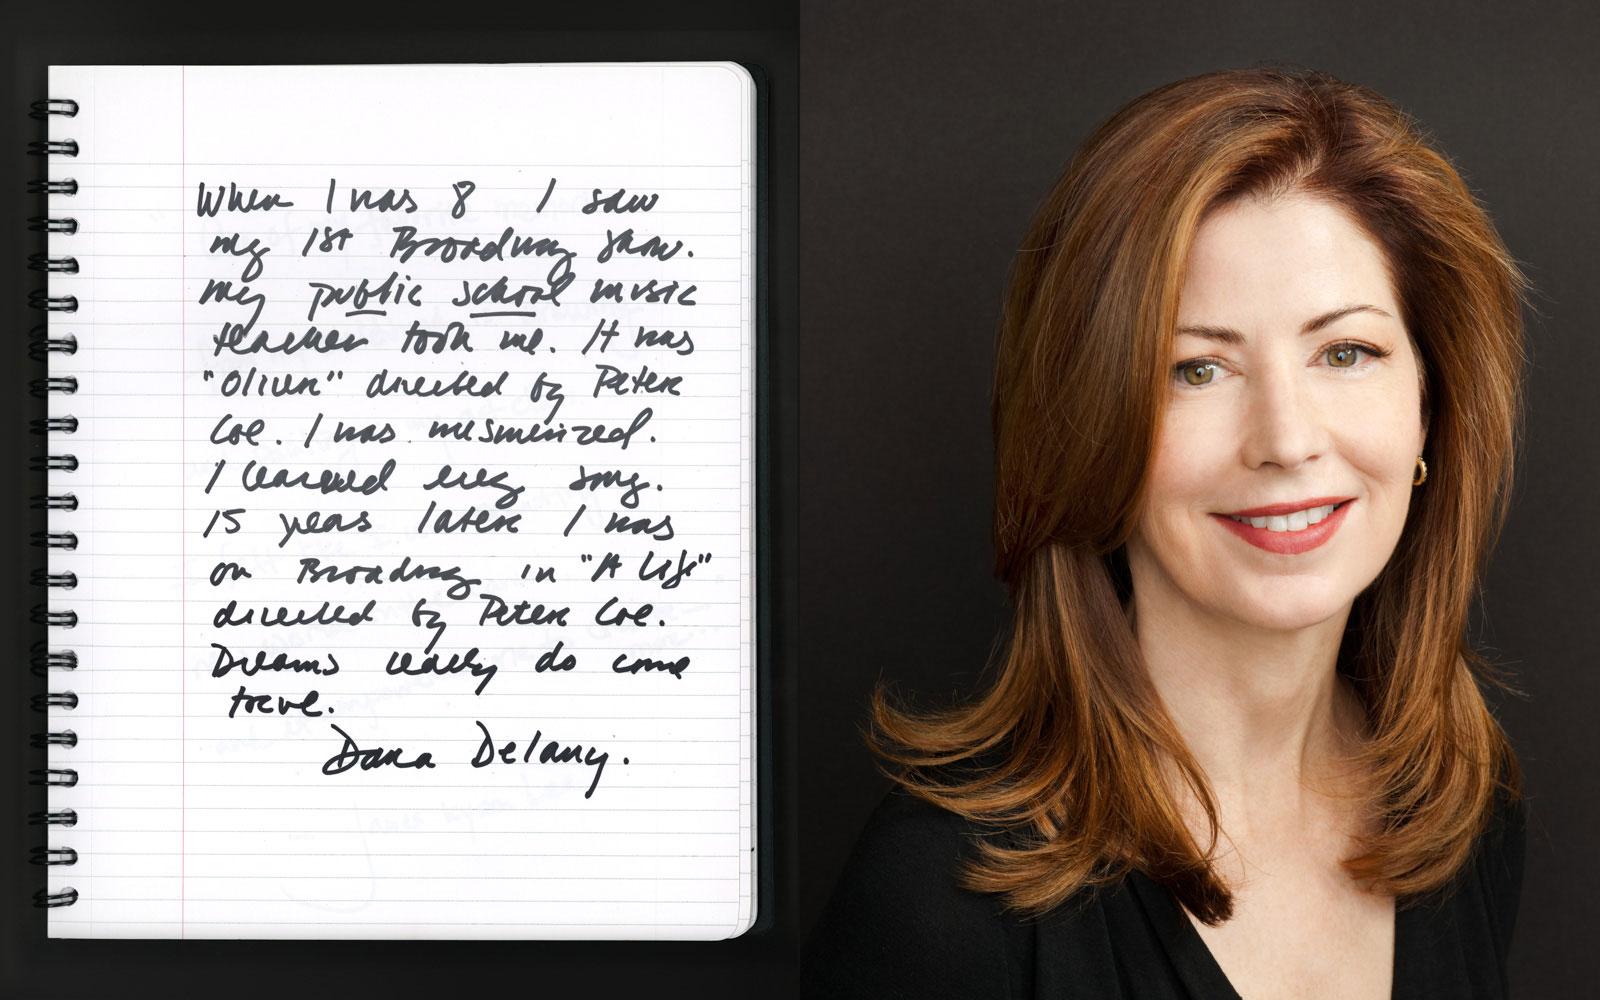 celebrity portrait photography of actress Dana Delany